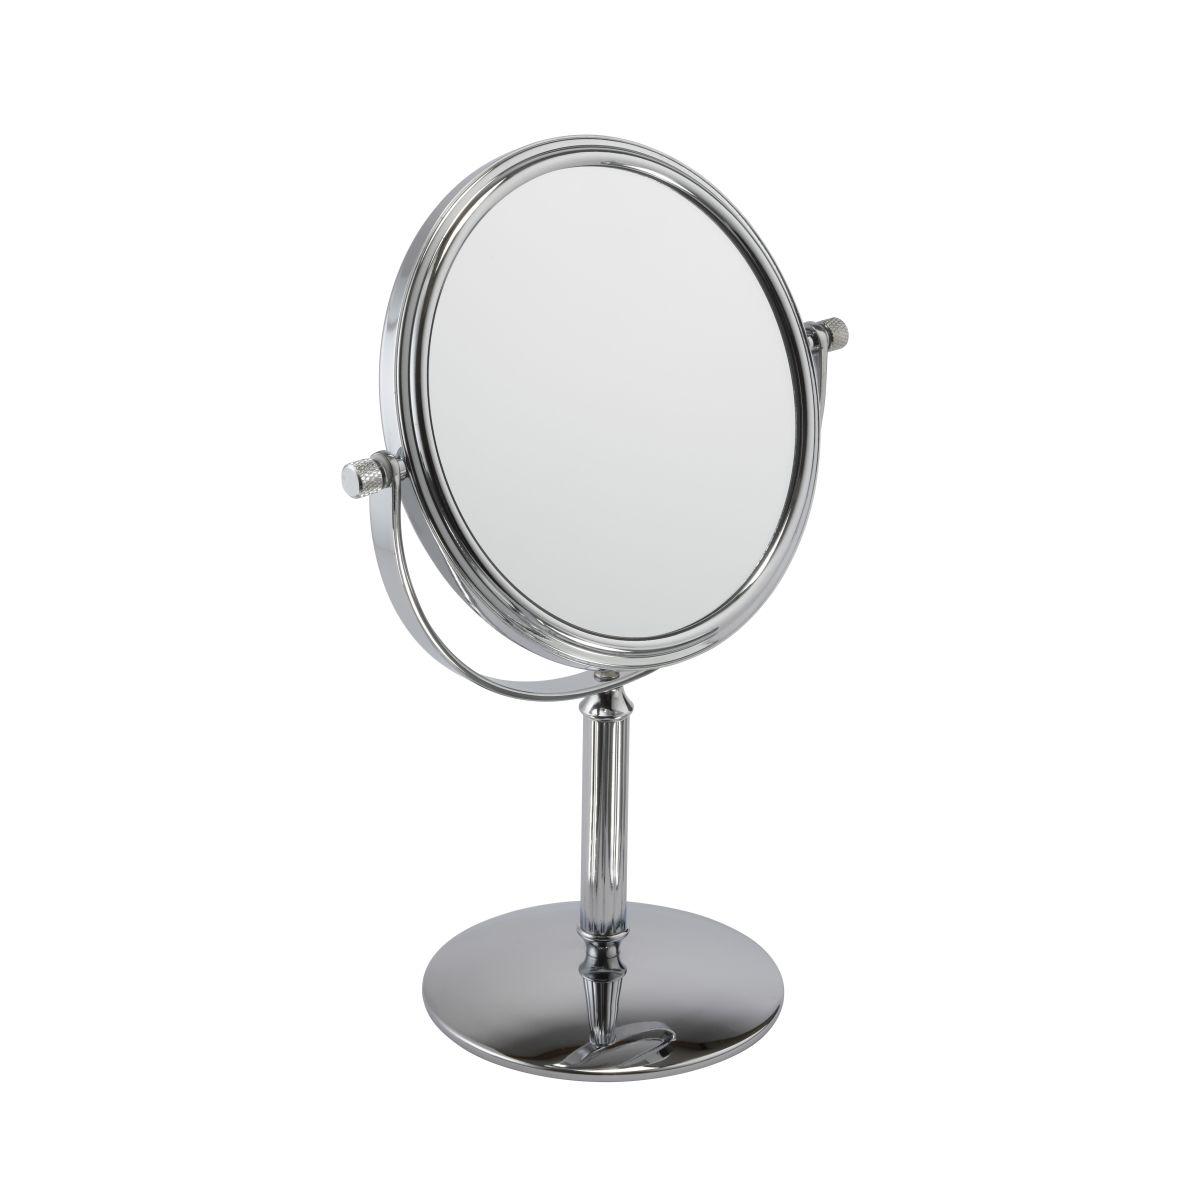 530 14 chrome 1 - Mirror Pedestal 5x Magnification 'Estelle' By Fmg - 530/14CHR